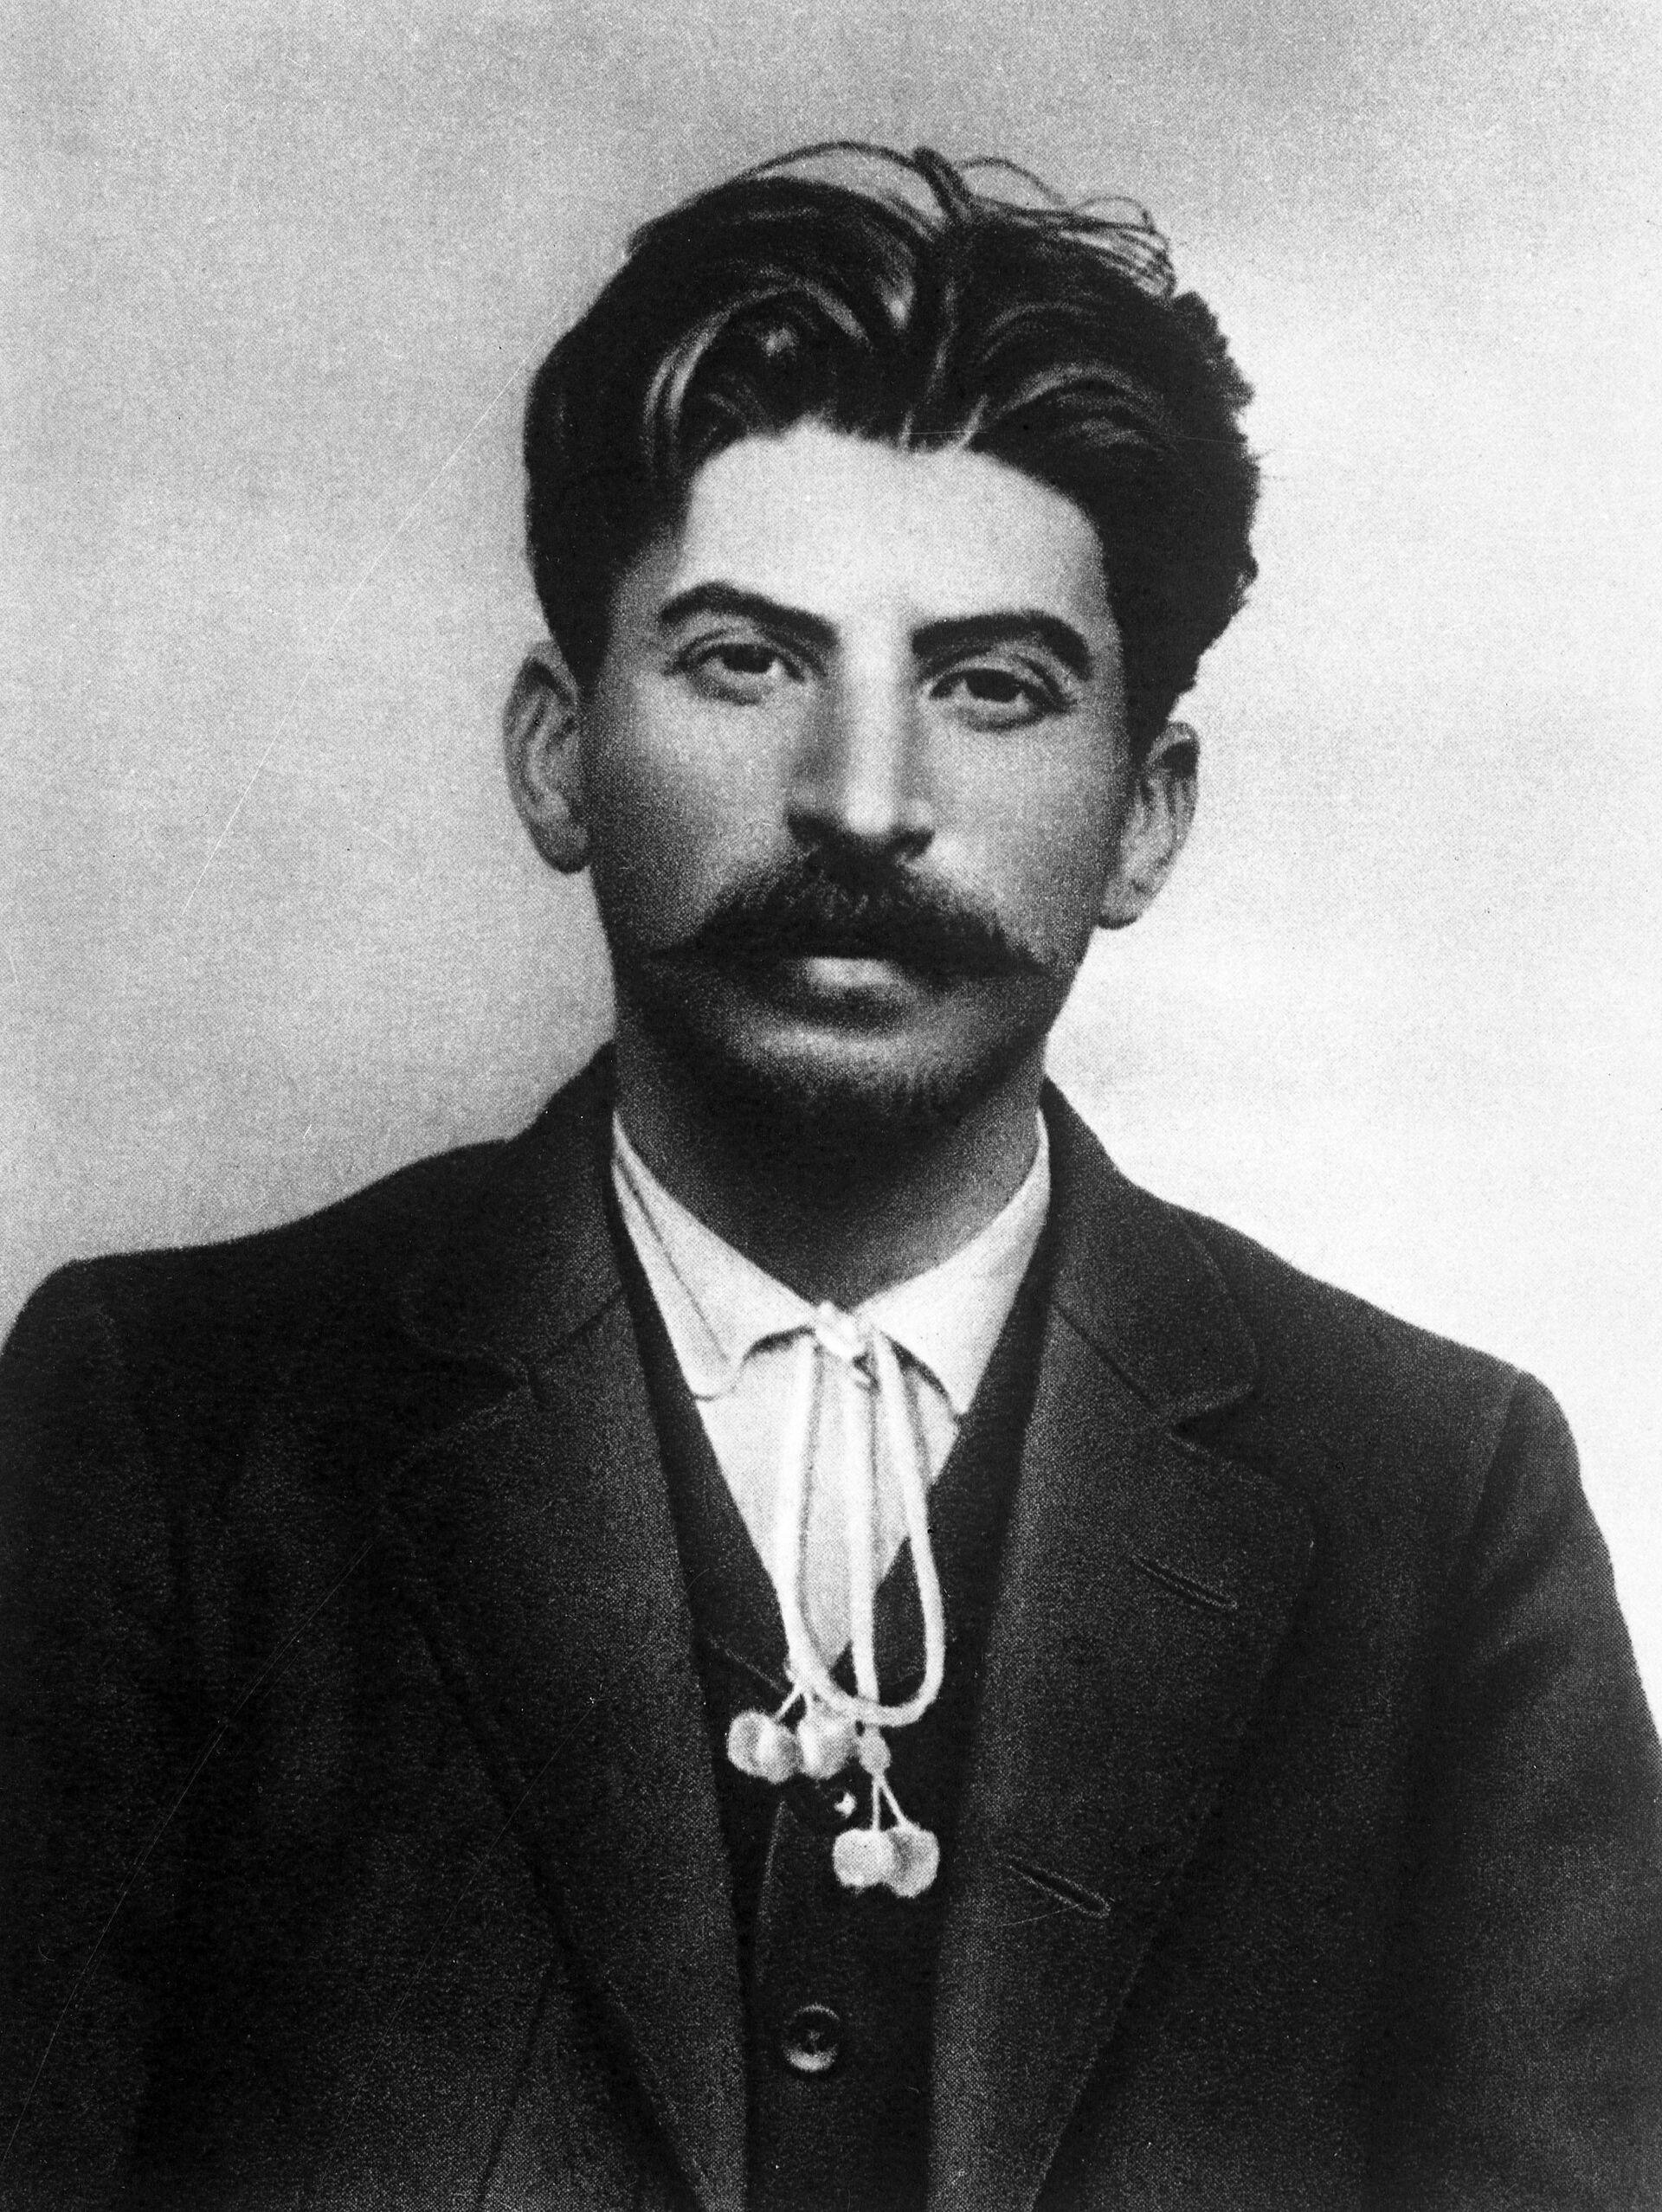 Иосиф Виссарионович Джугашвили, 1913 год - Sputnik Грузия, 1920, 24.08.2021